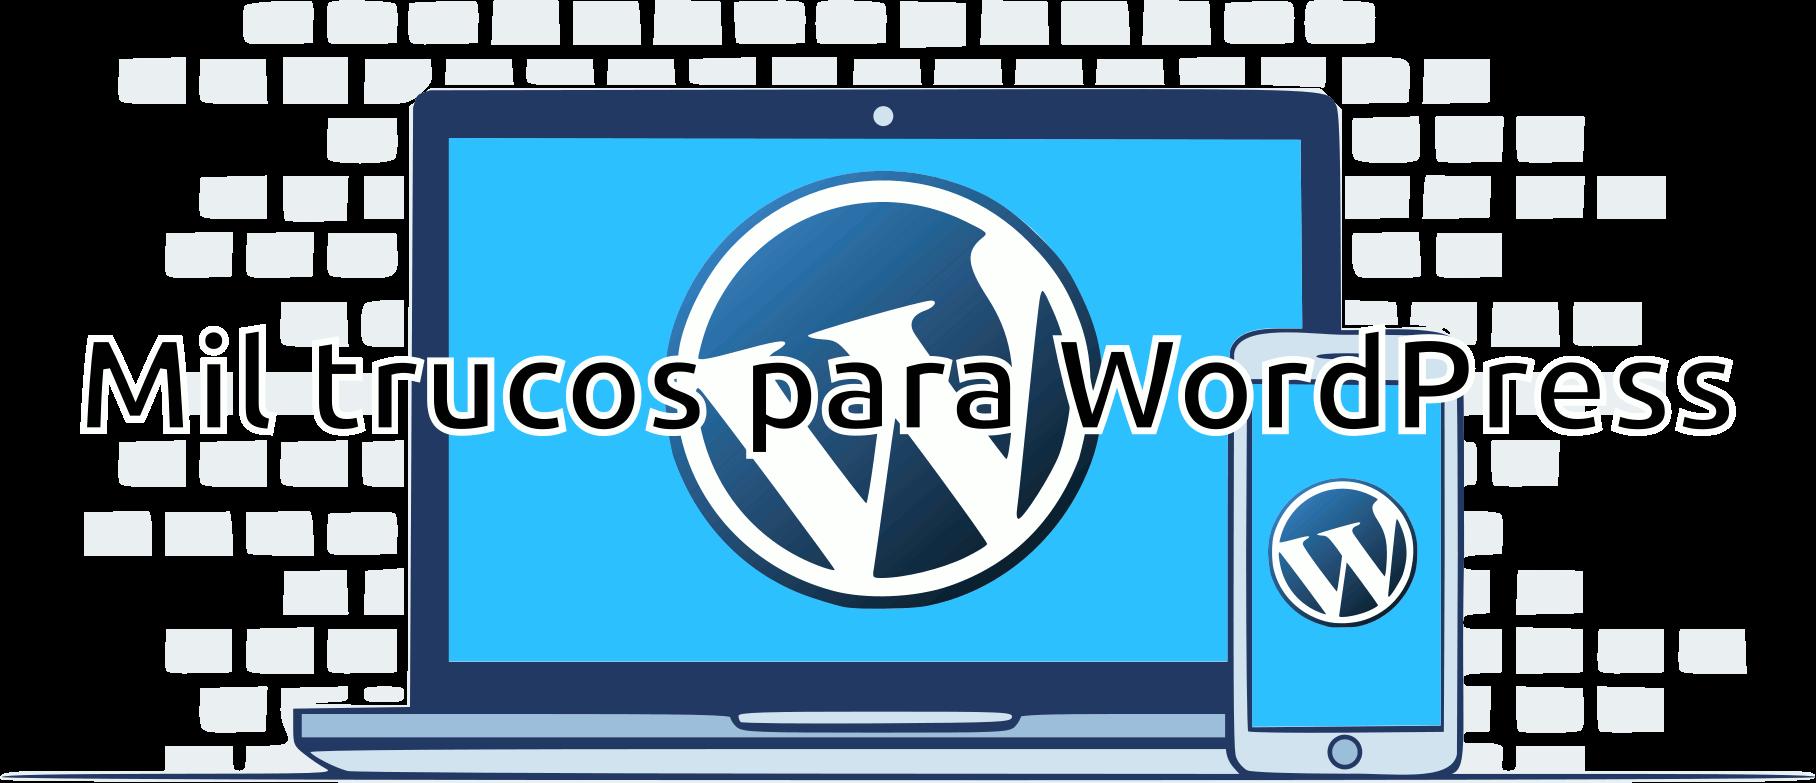 Mil trucos para WordPress